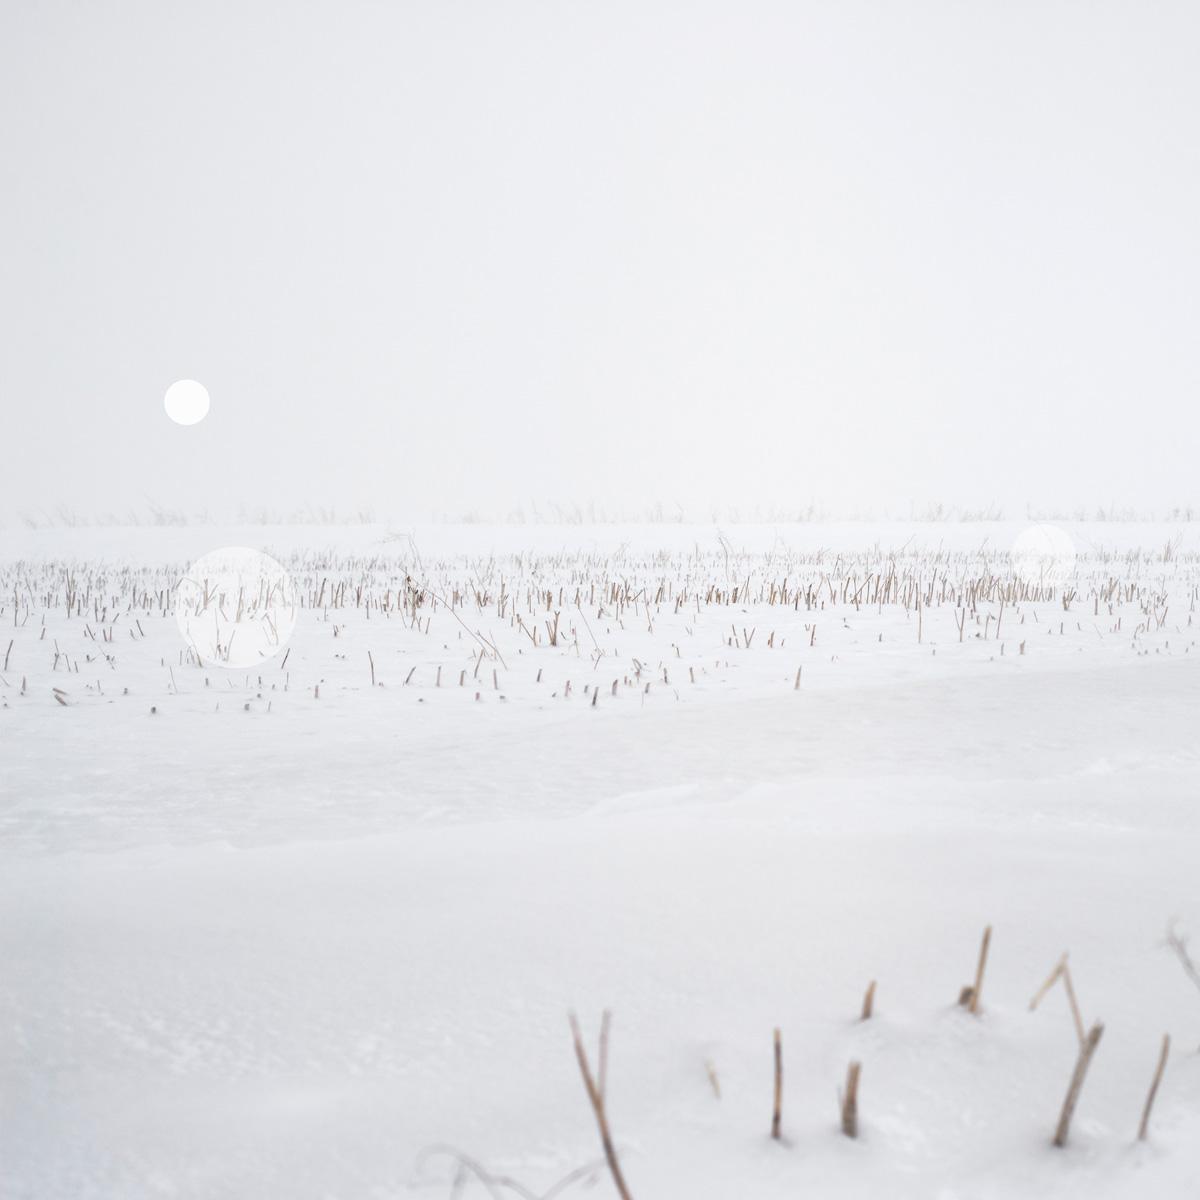 Artereal_Gallery_2014_Rebecca_Beardmore_Snow_Grasslands_2